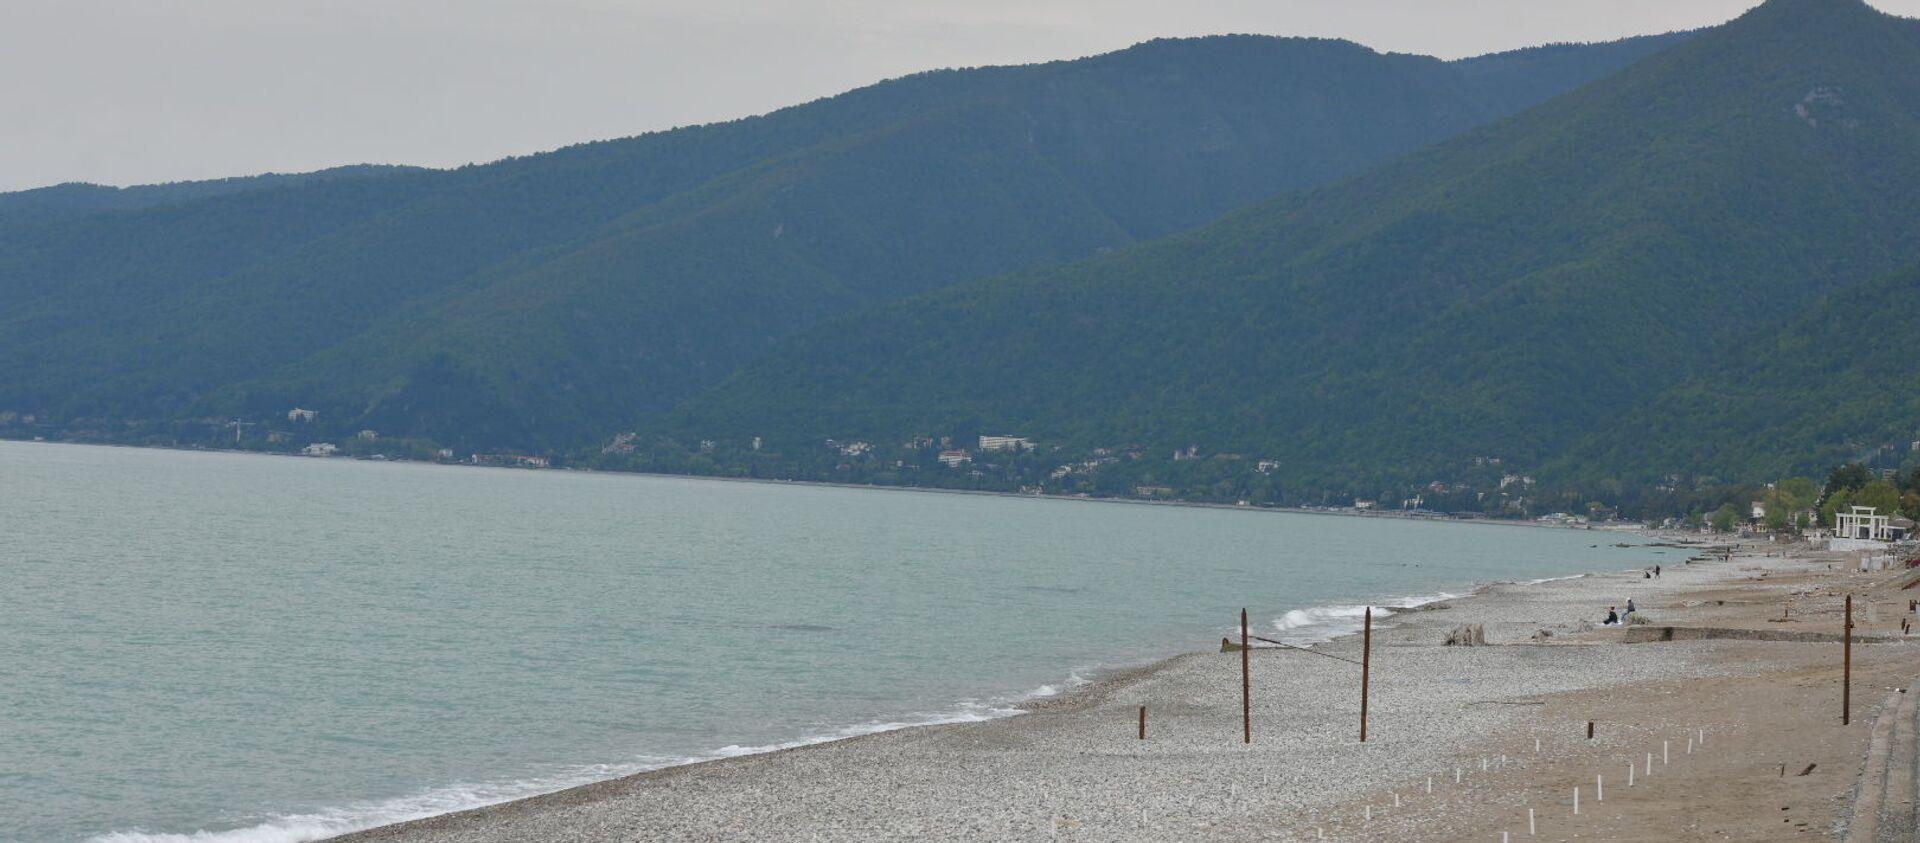 Побережье Гагры  - Sputnik Абхазия, 1920, 24.07.2021